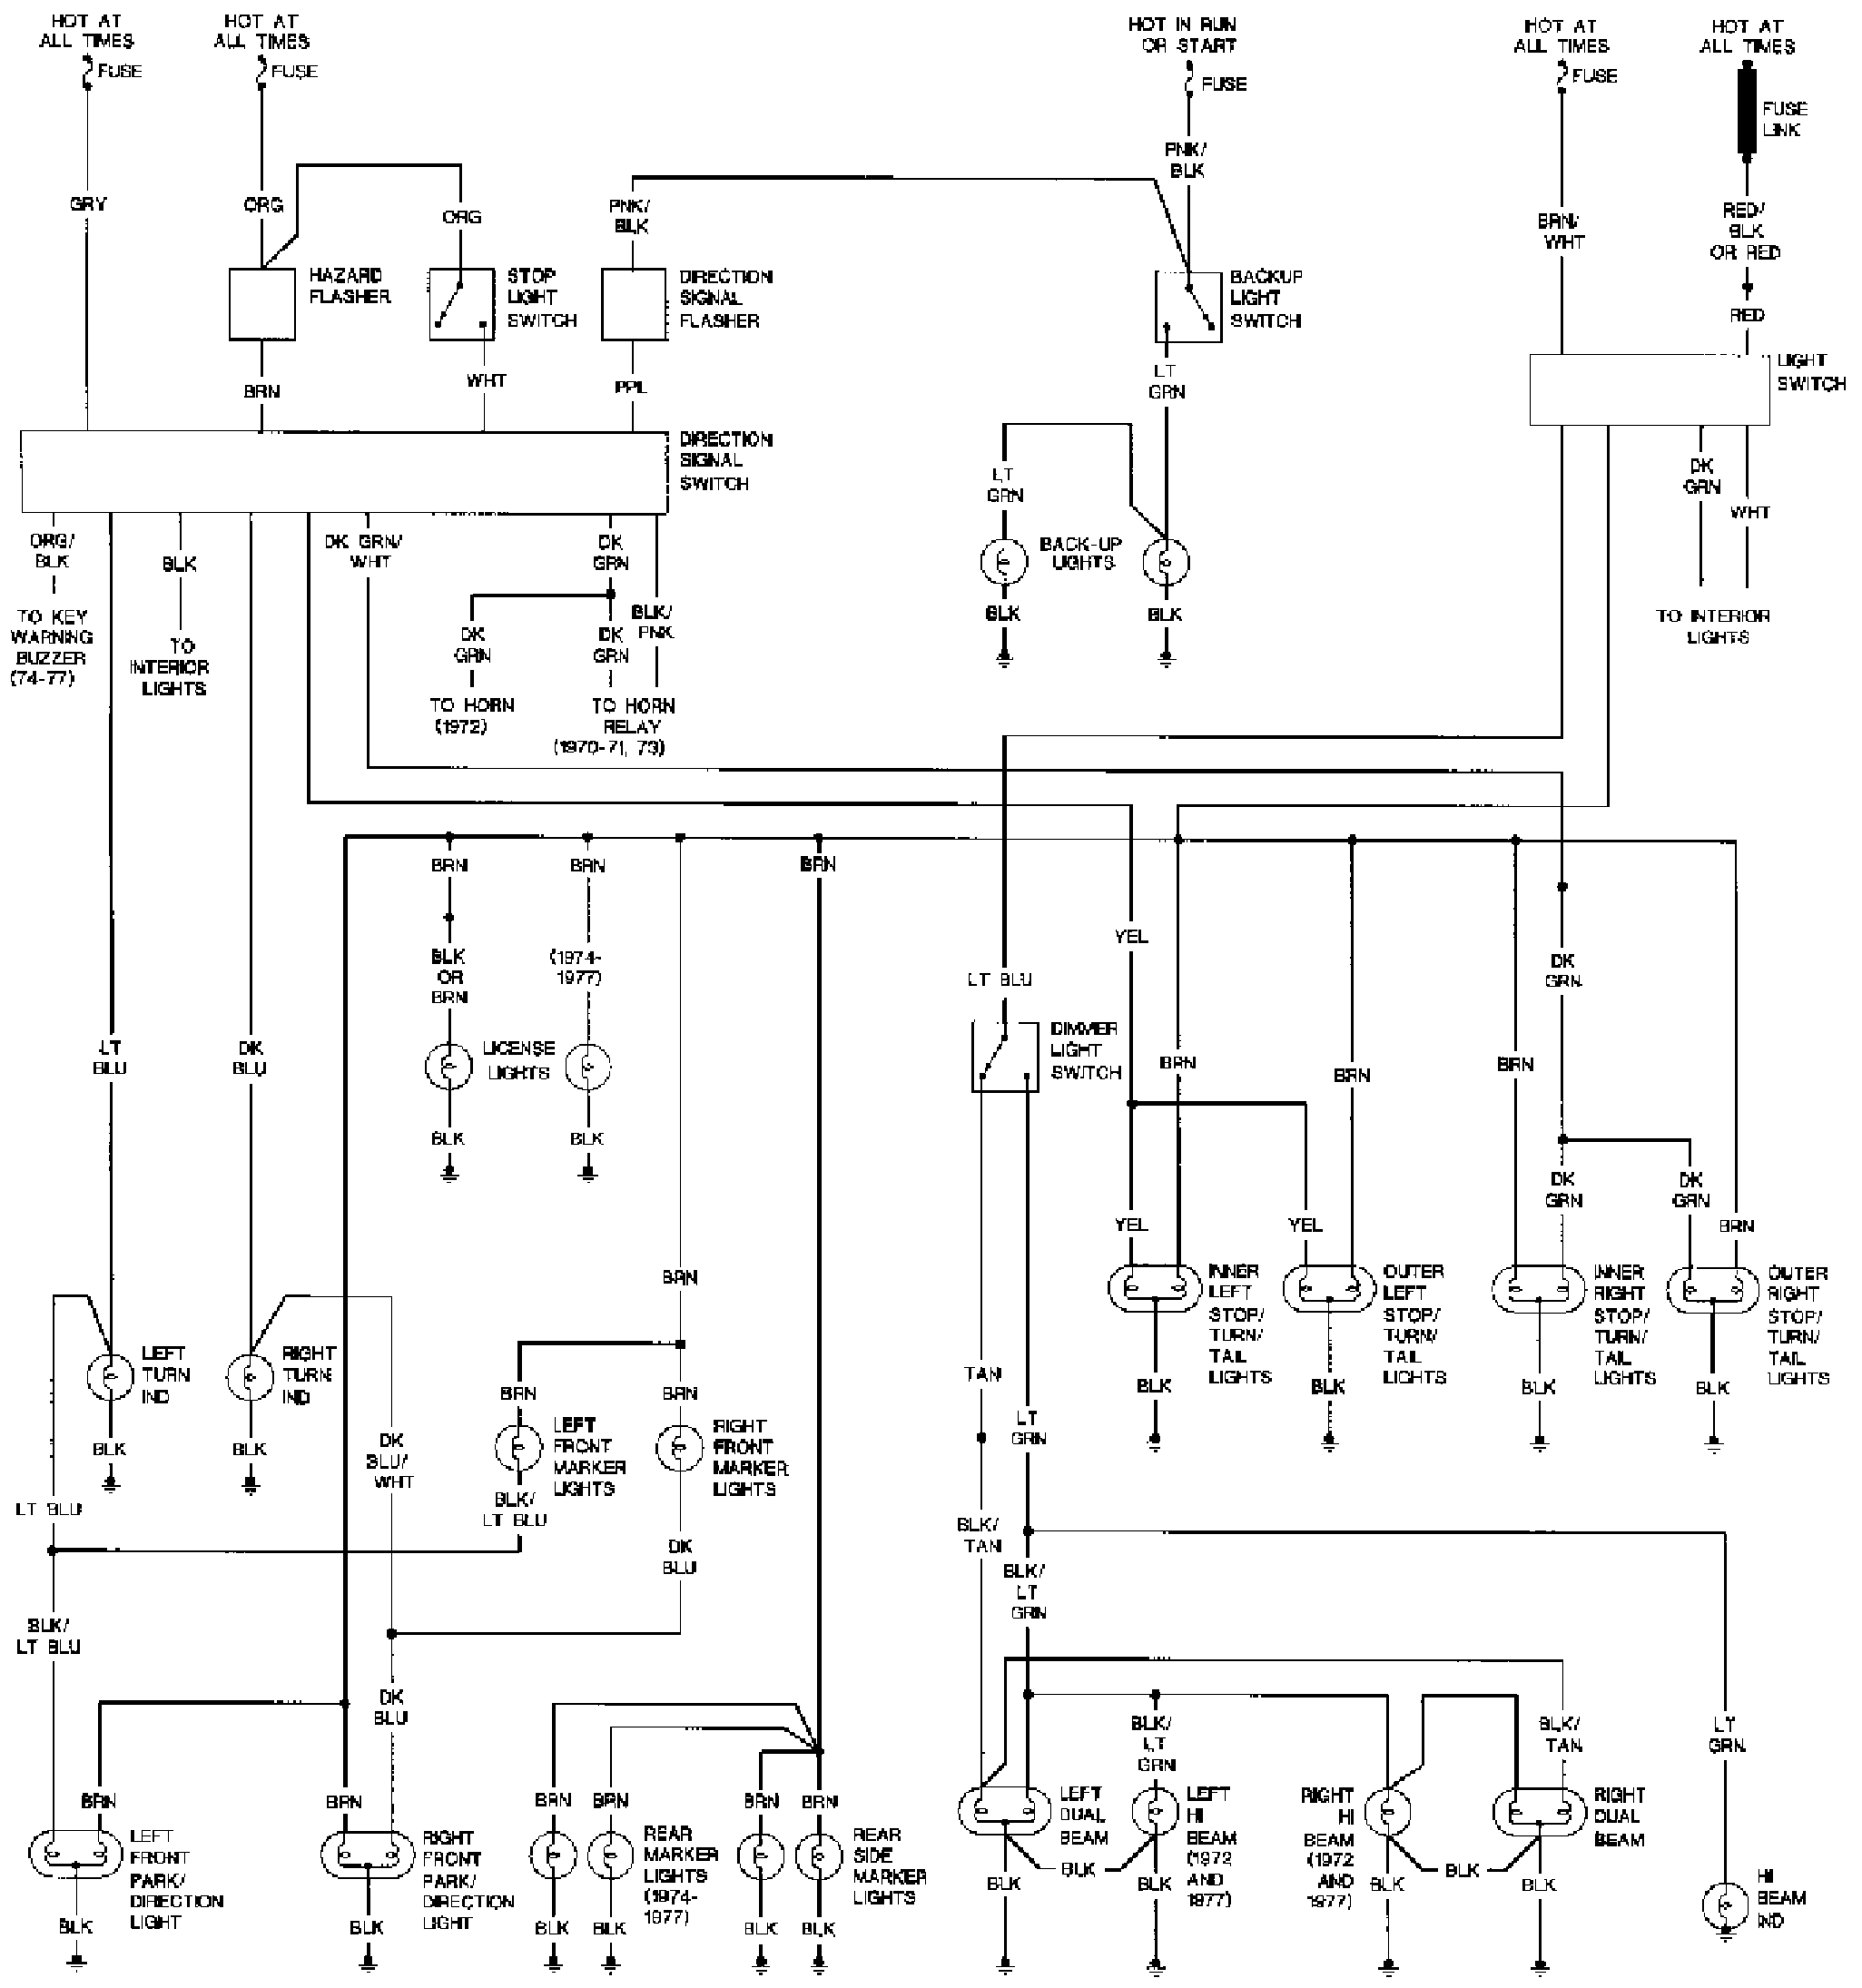 Diagram 1997 Oldsmobile 88 Engine Diagram Full Version Hd Quality Engine Diagram Iphonereview Drivefermierlyonnais Fr